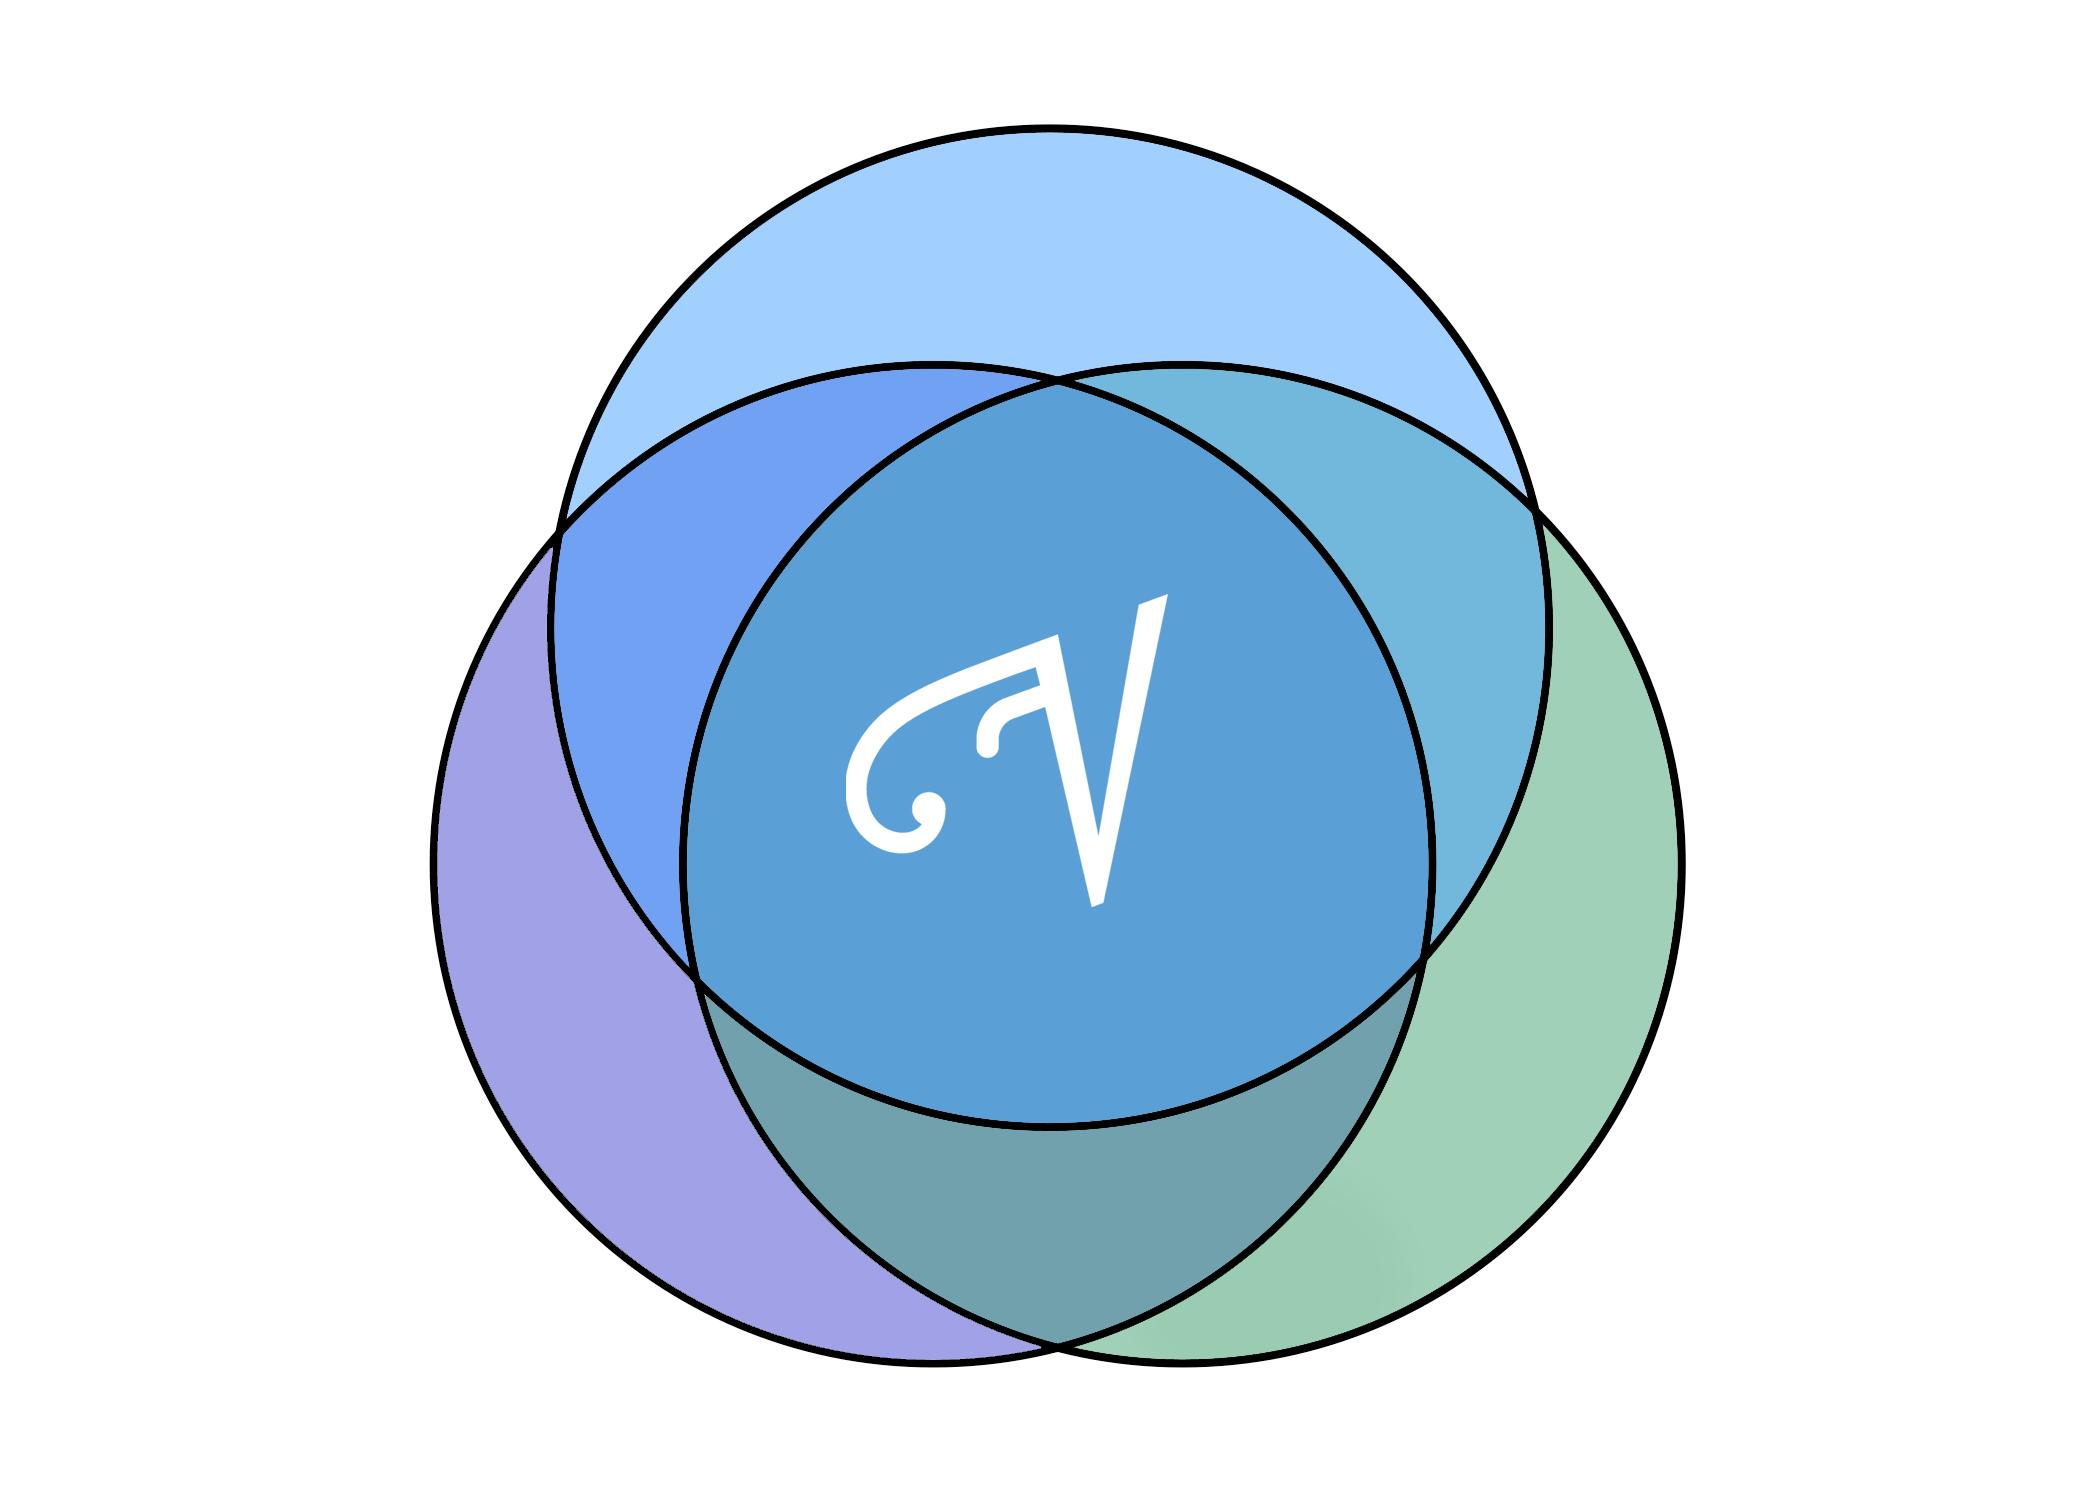 v5_more_triple_bottom_line.png